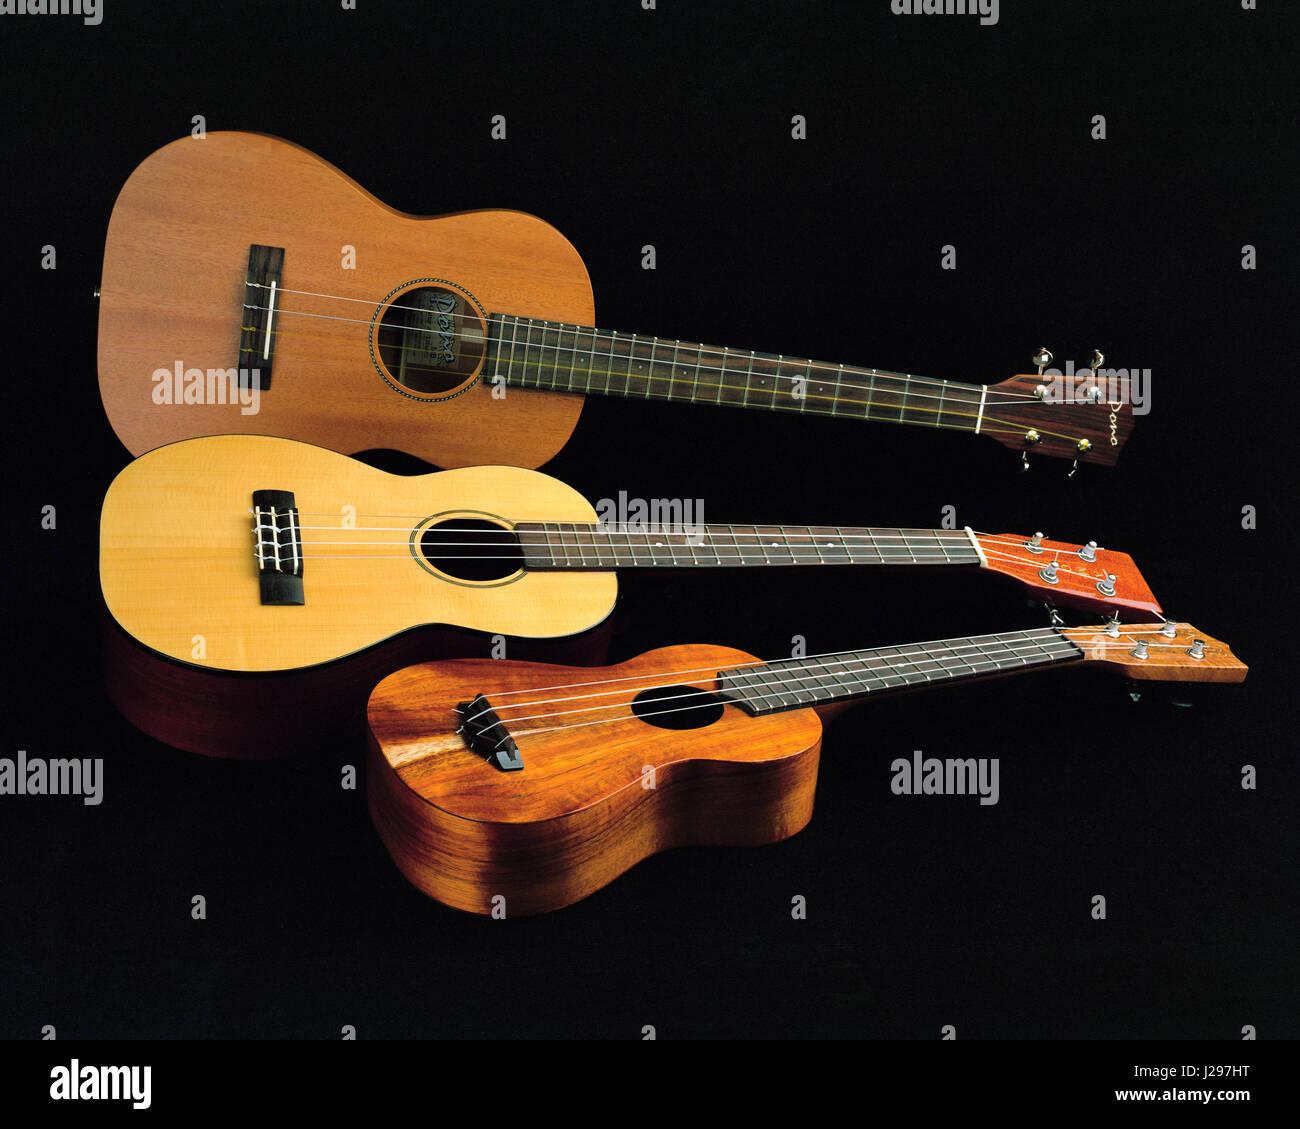 Trio of soprano, tenor and baritone ukuleles - Stock Image